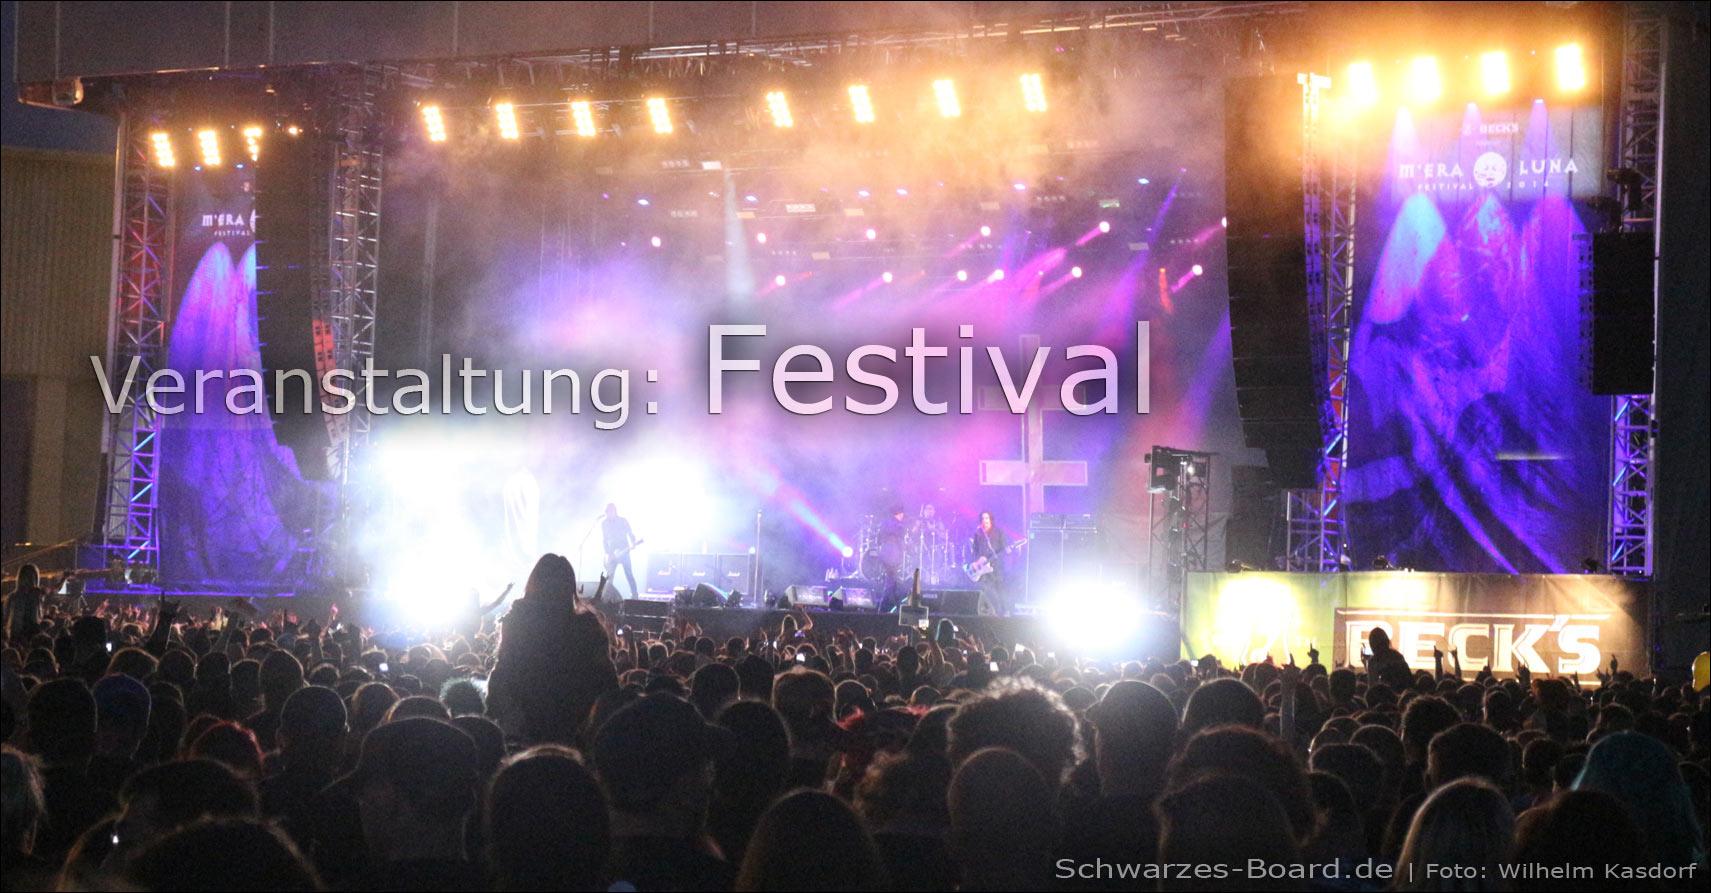 Meraluna-Festival Hauptbühne